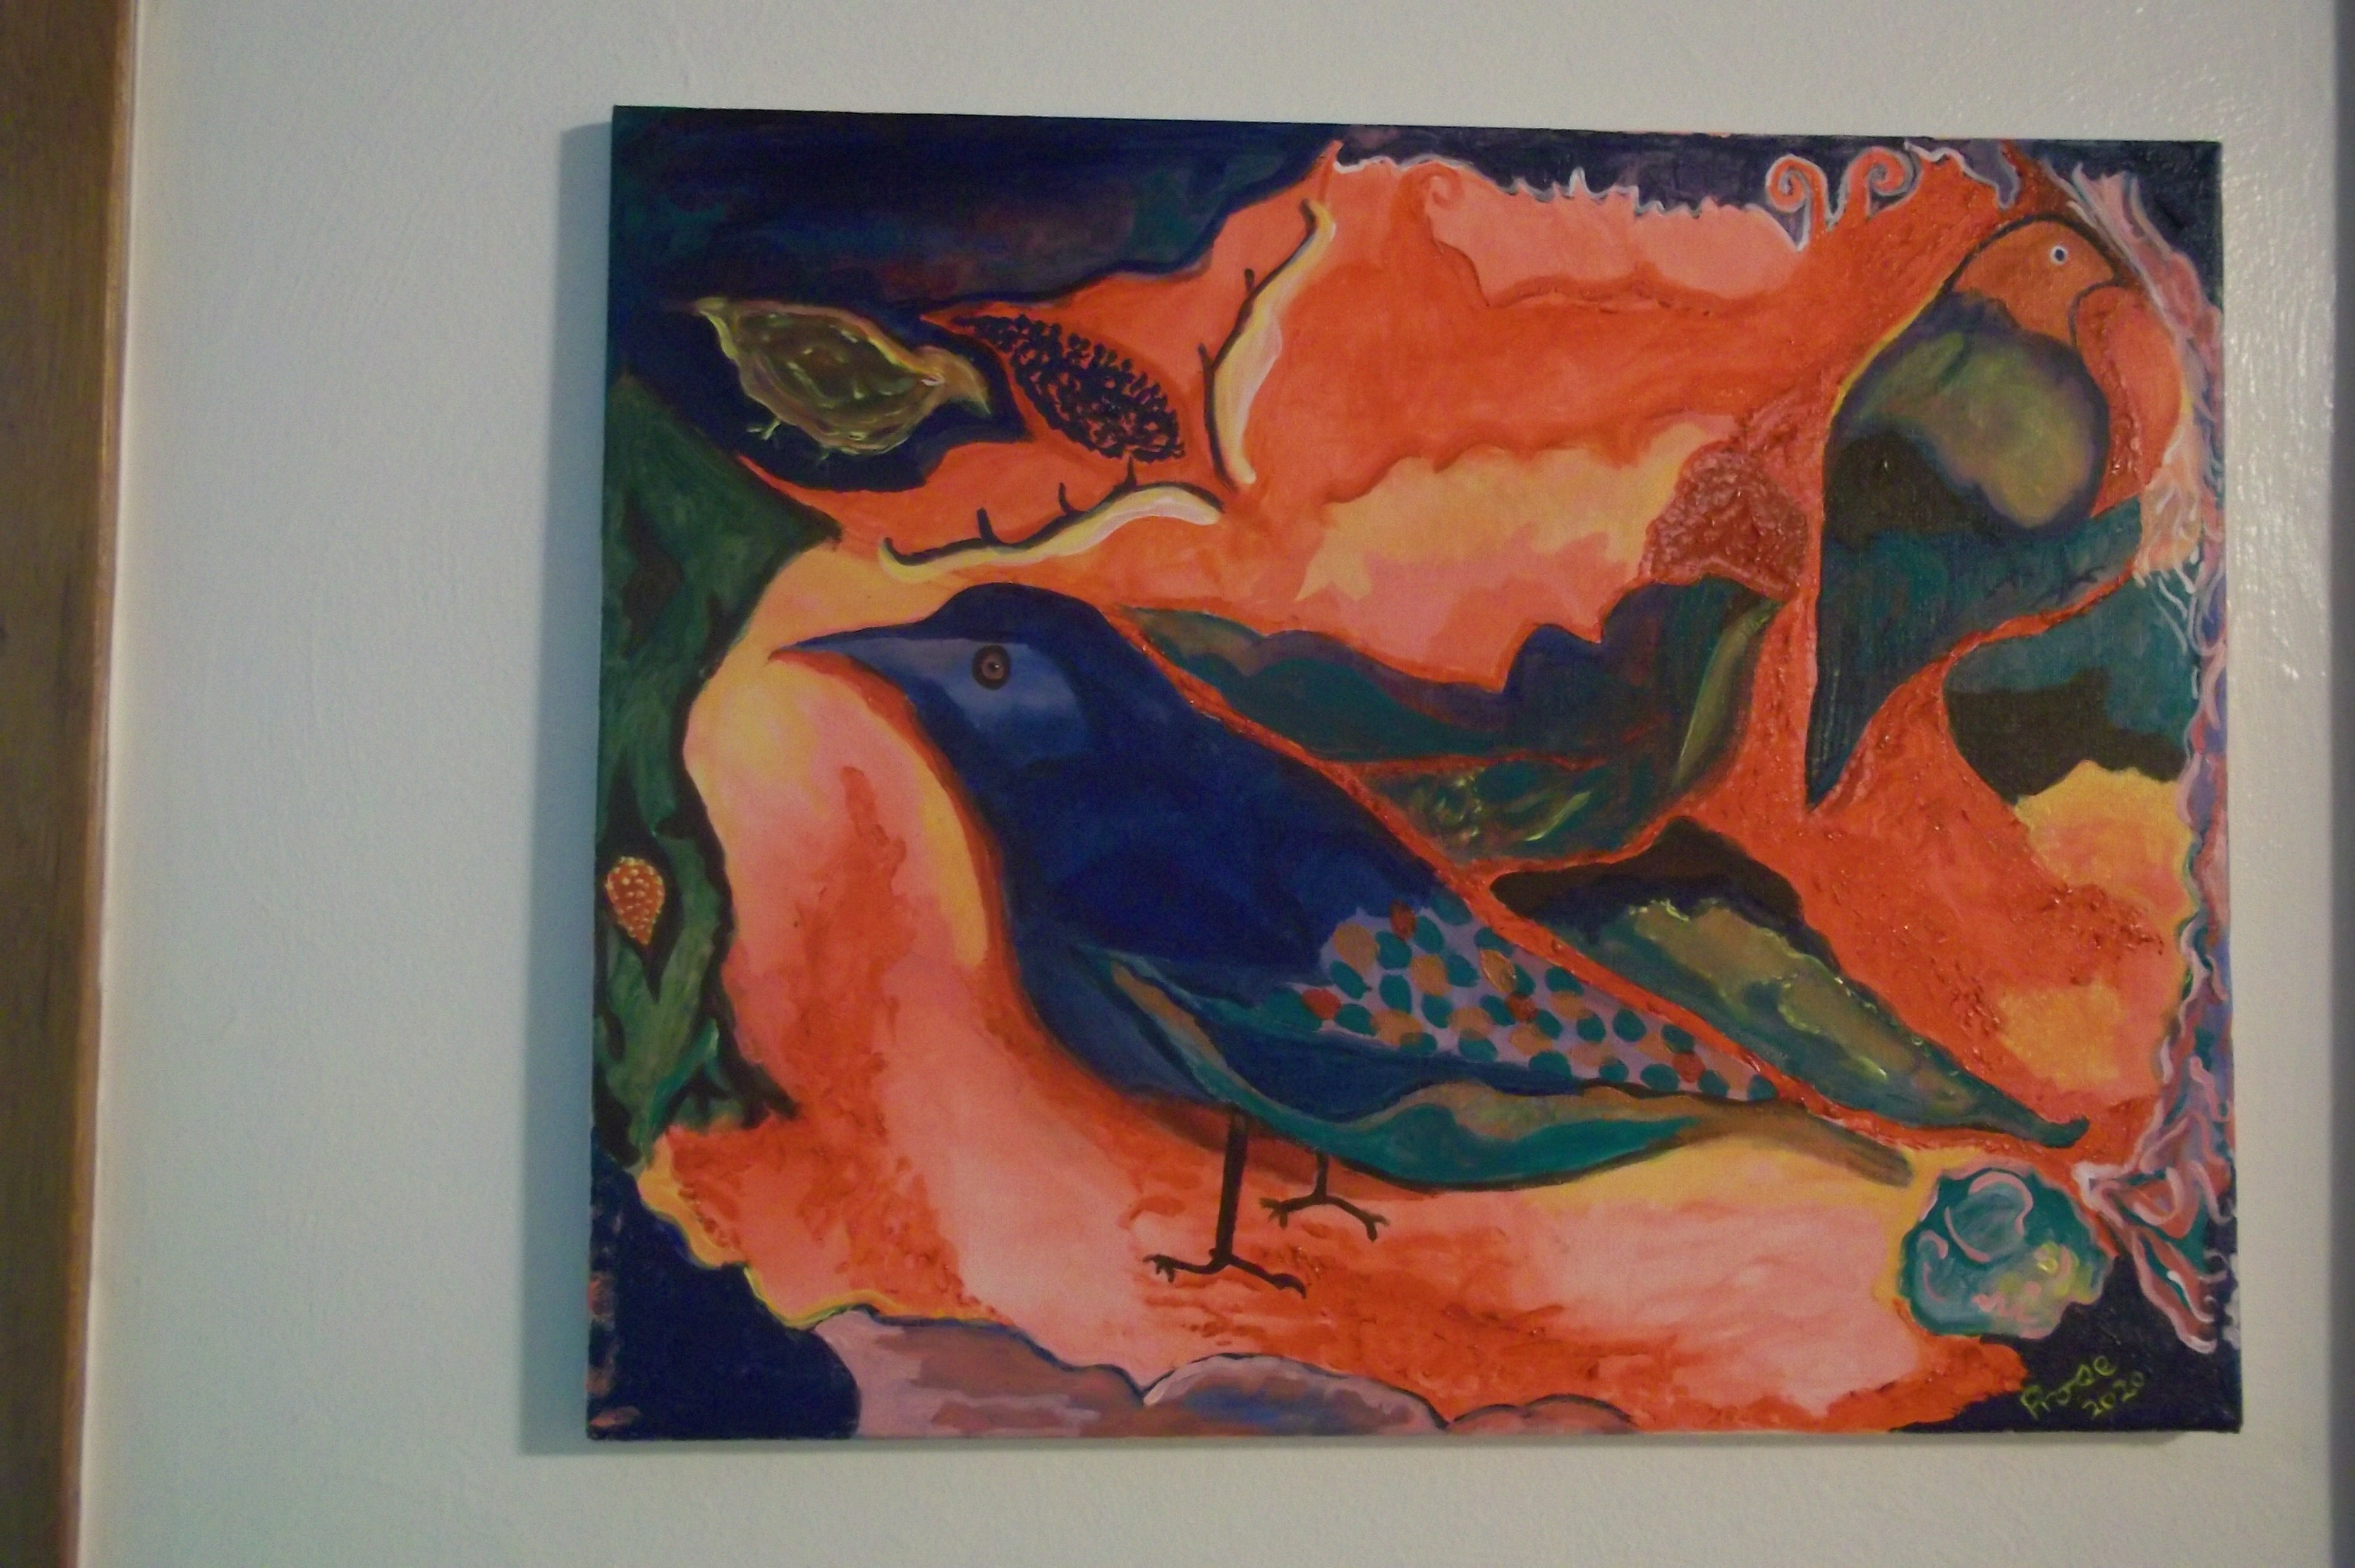 Birds in a Flower -  (acrylic)  16 x 20 - $250